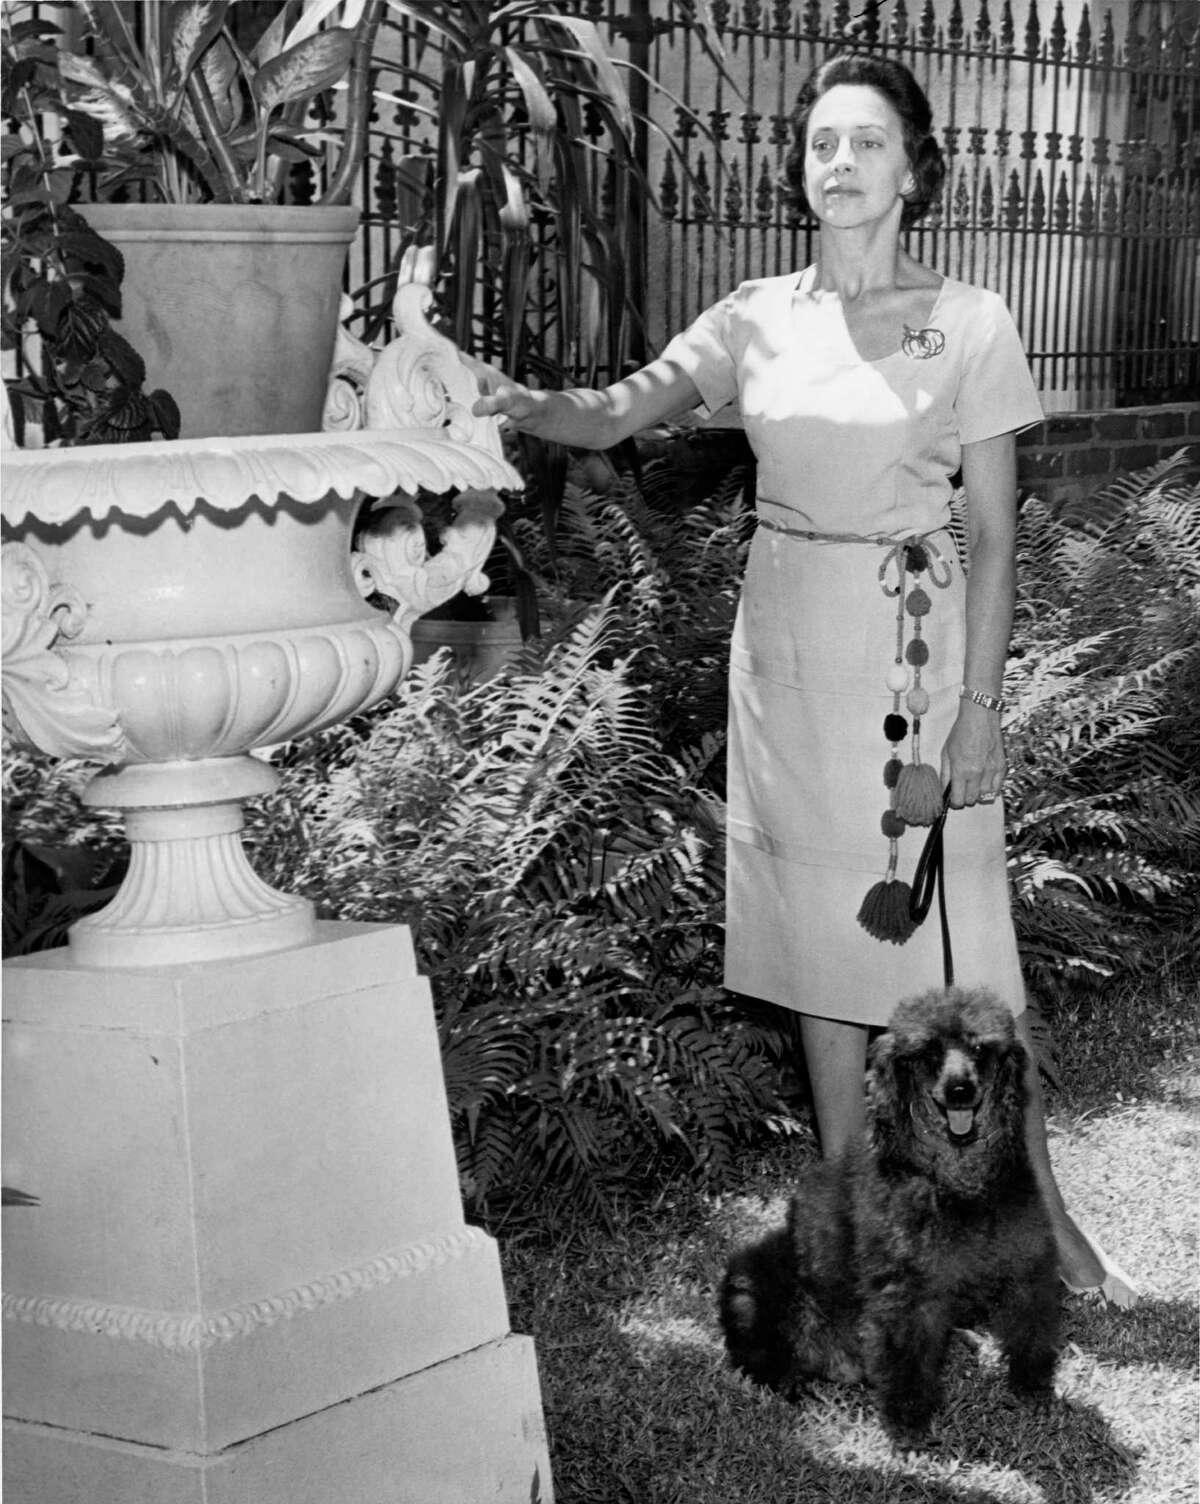 Houston Foun-dation for Ballet's director Tatiana Semenova in 1962.